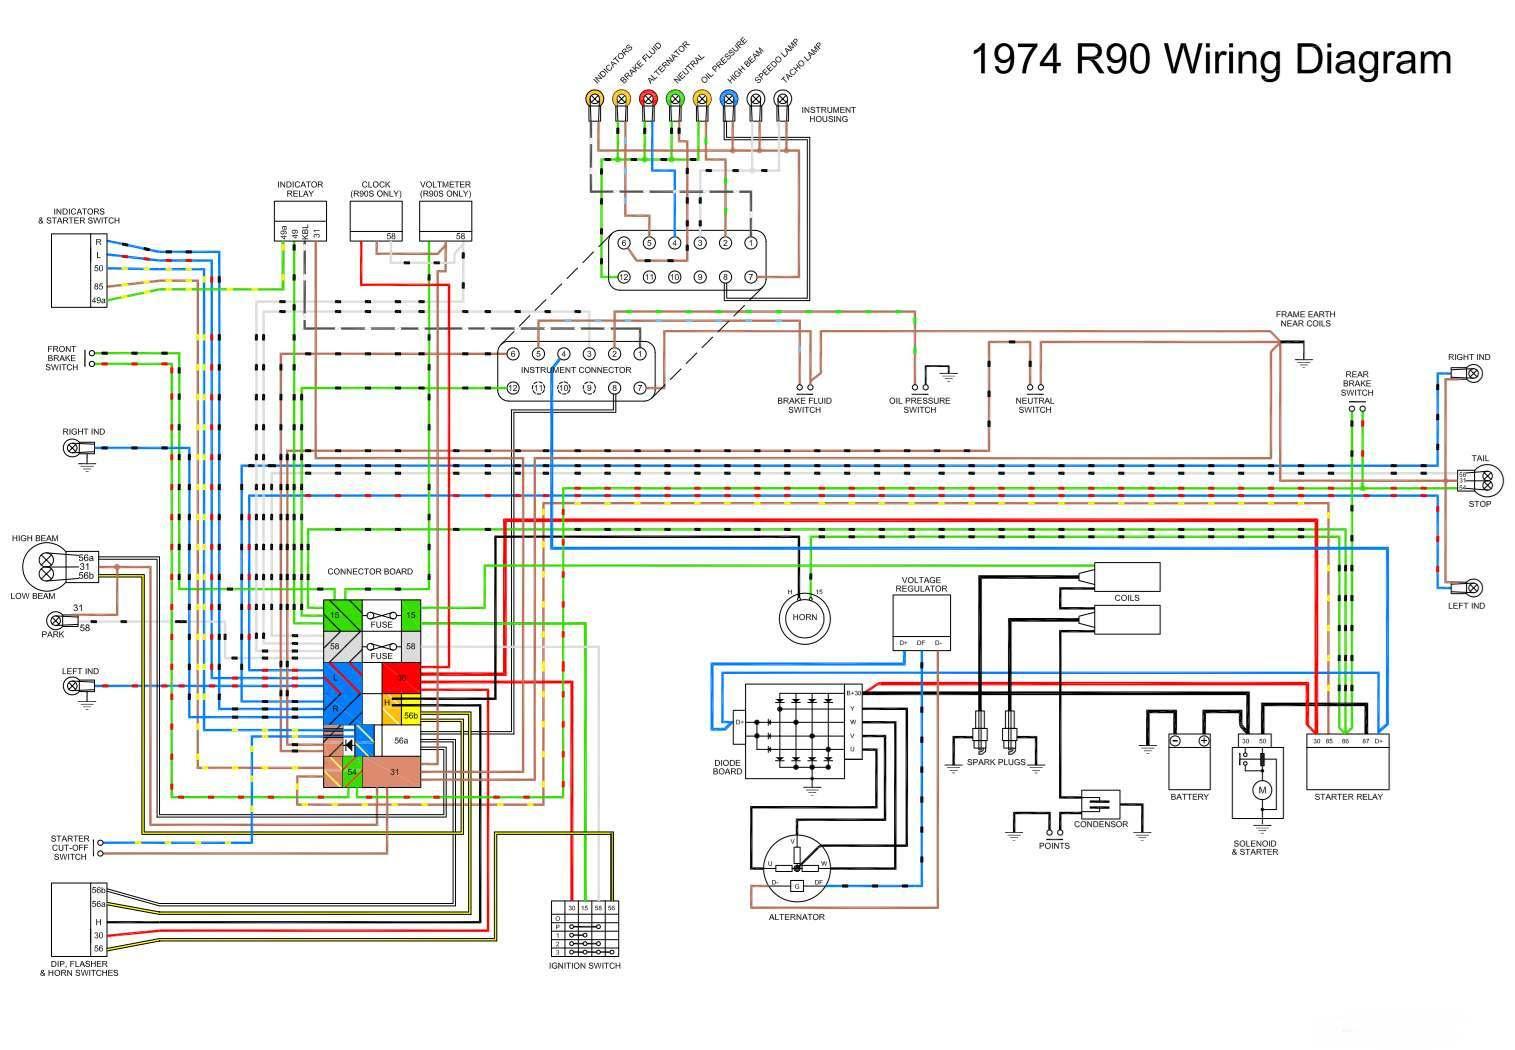 Diagram Bmw R75 6 Wiring Diagram Full Version Hd Quality Wiring Diagram Diagramsloura Videoproiettori3d It